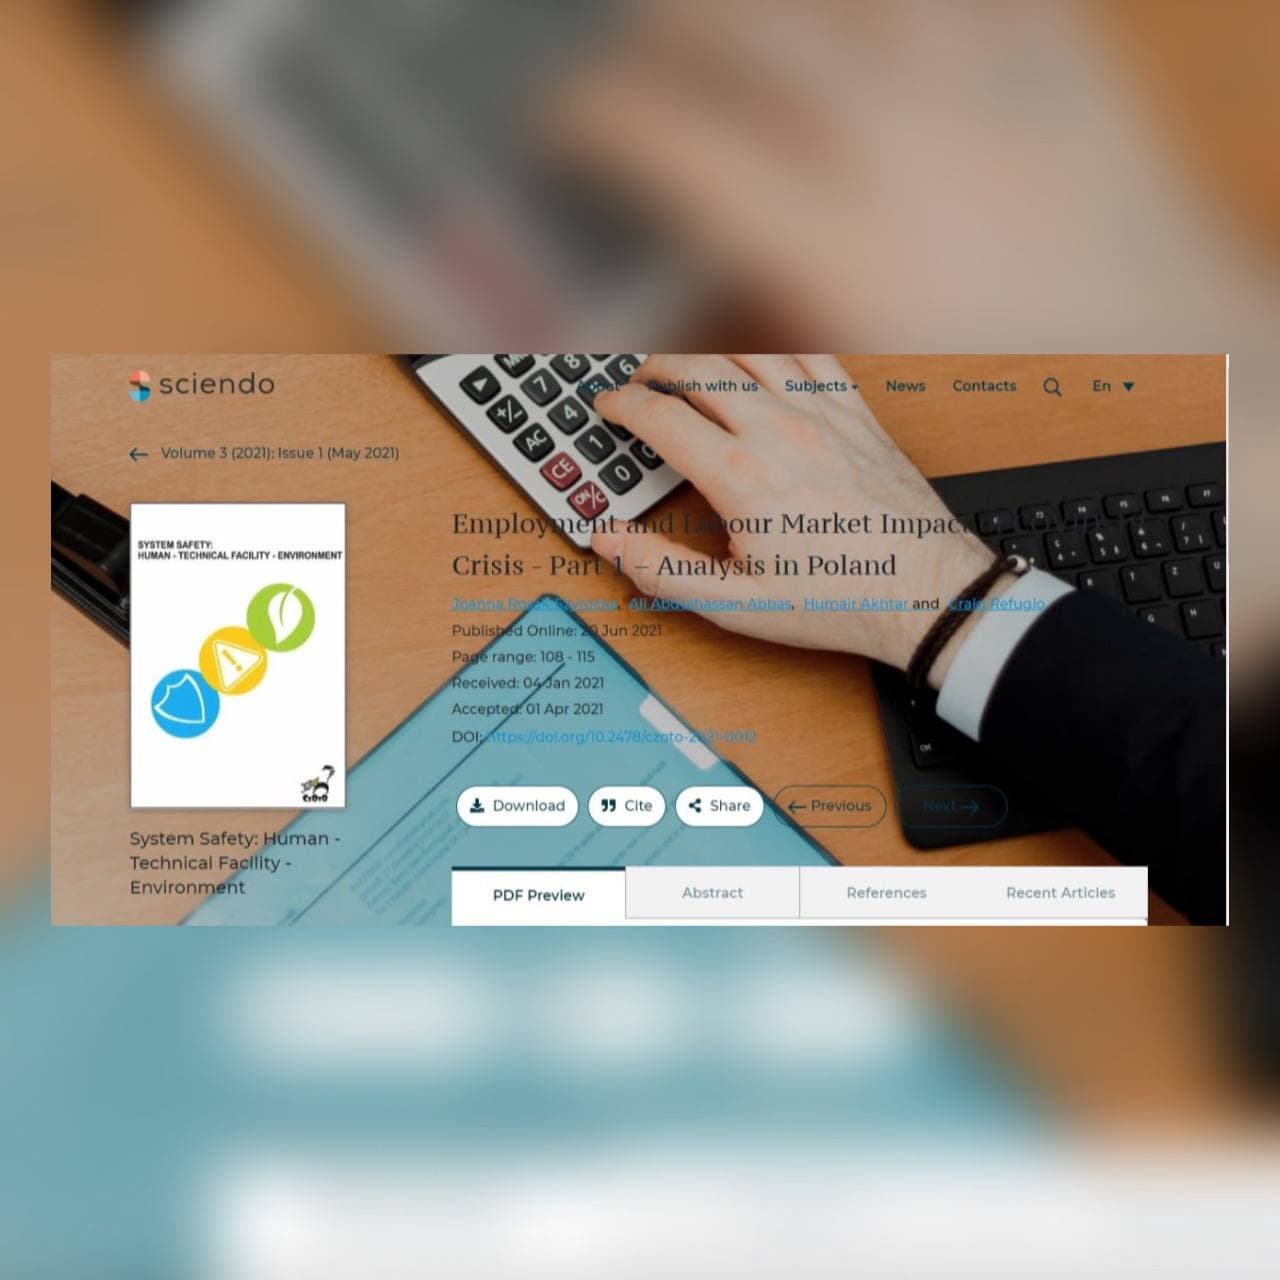 You are currently viewing فريق بحثي من جامعة كربلاء وجامعة تشيستوشوا ينشر مقالة علمية عن التوظيف وتأثير سوق العمل لأزمة COVID-19